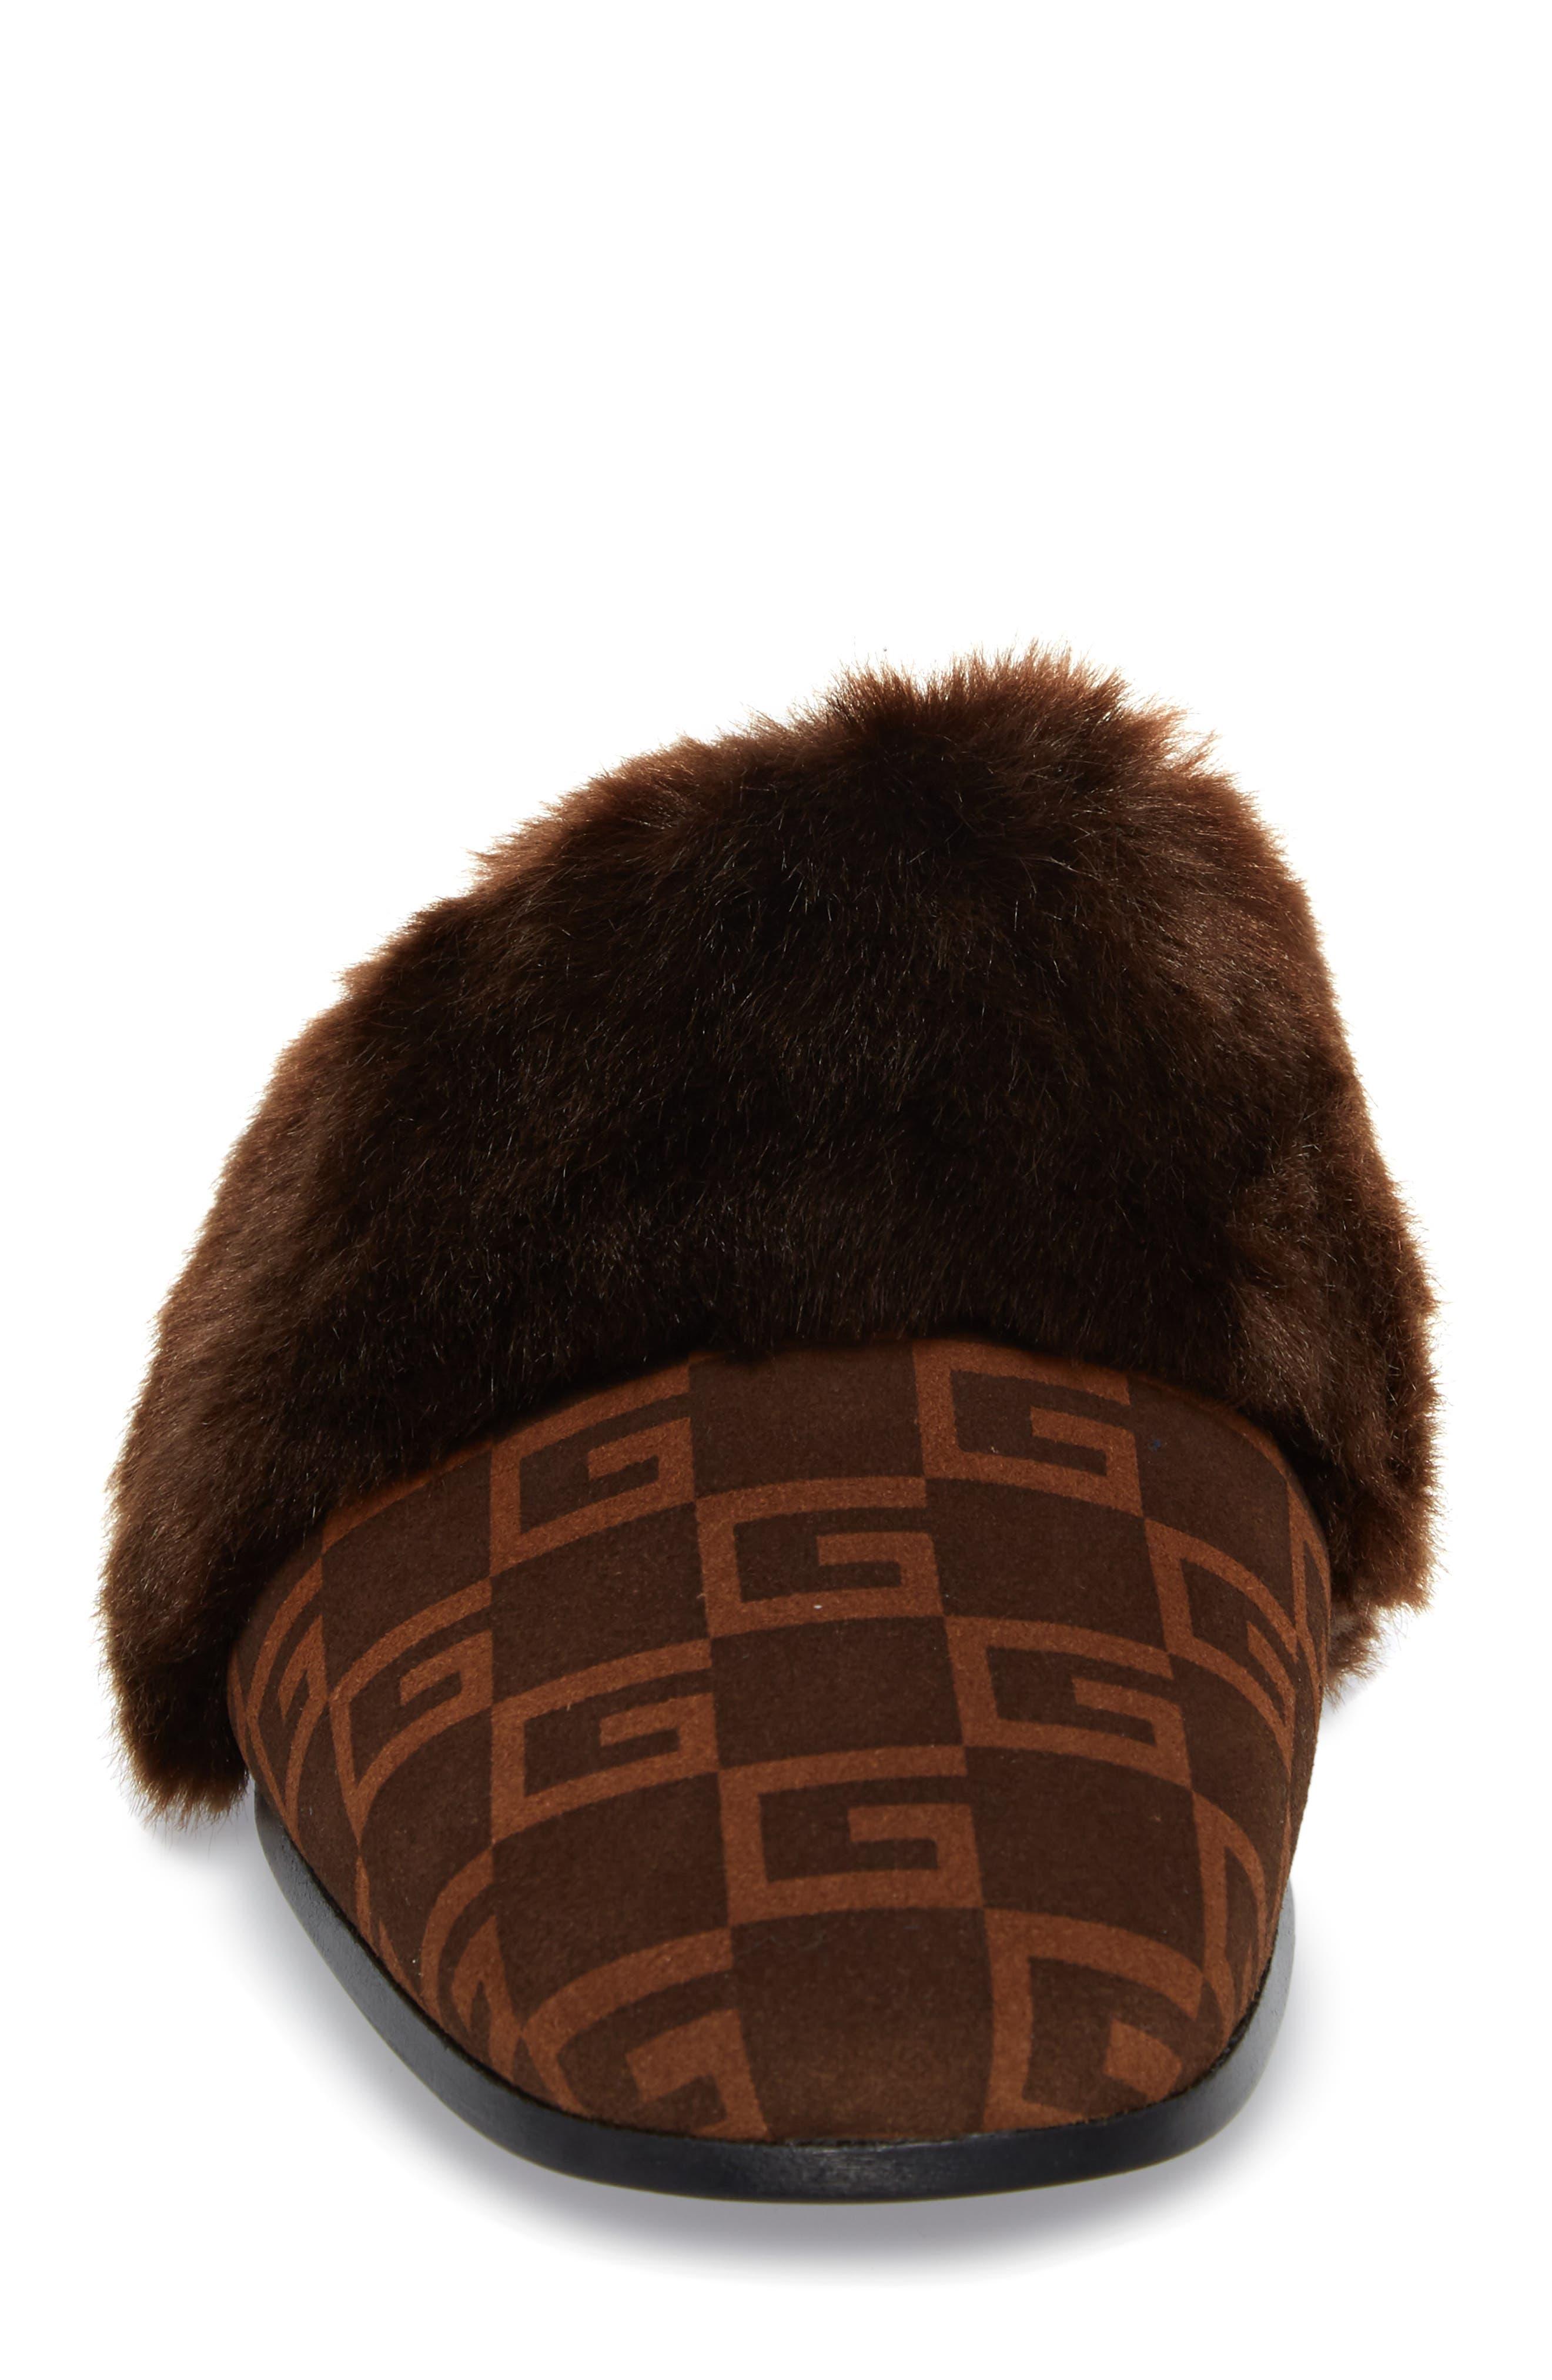 Square-G Faux Fur Slipper,                             Alternate thumbnail 4, color,                             BROWN/ SIGARO